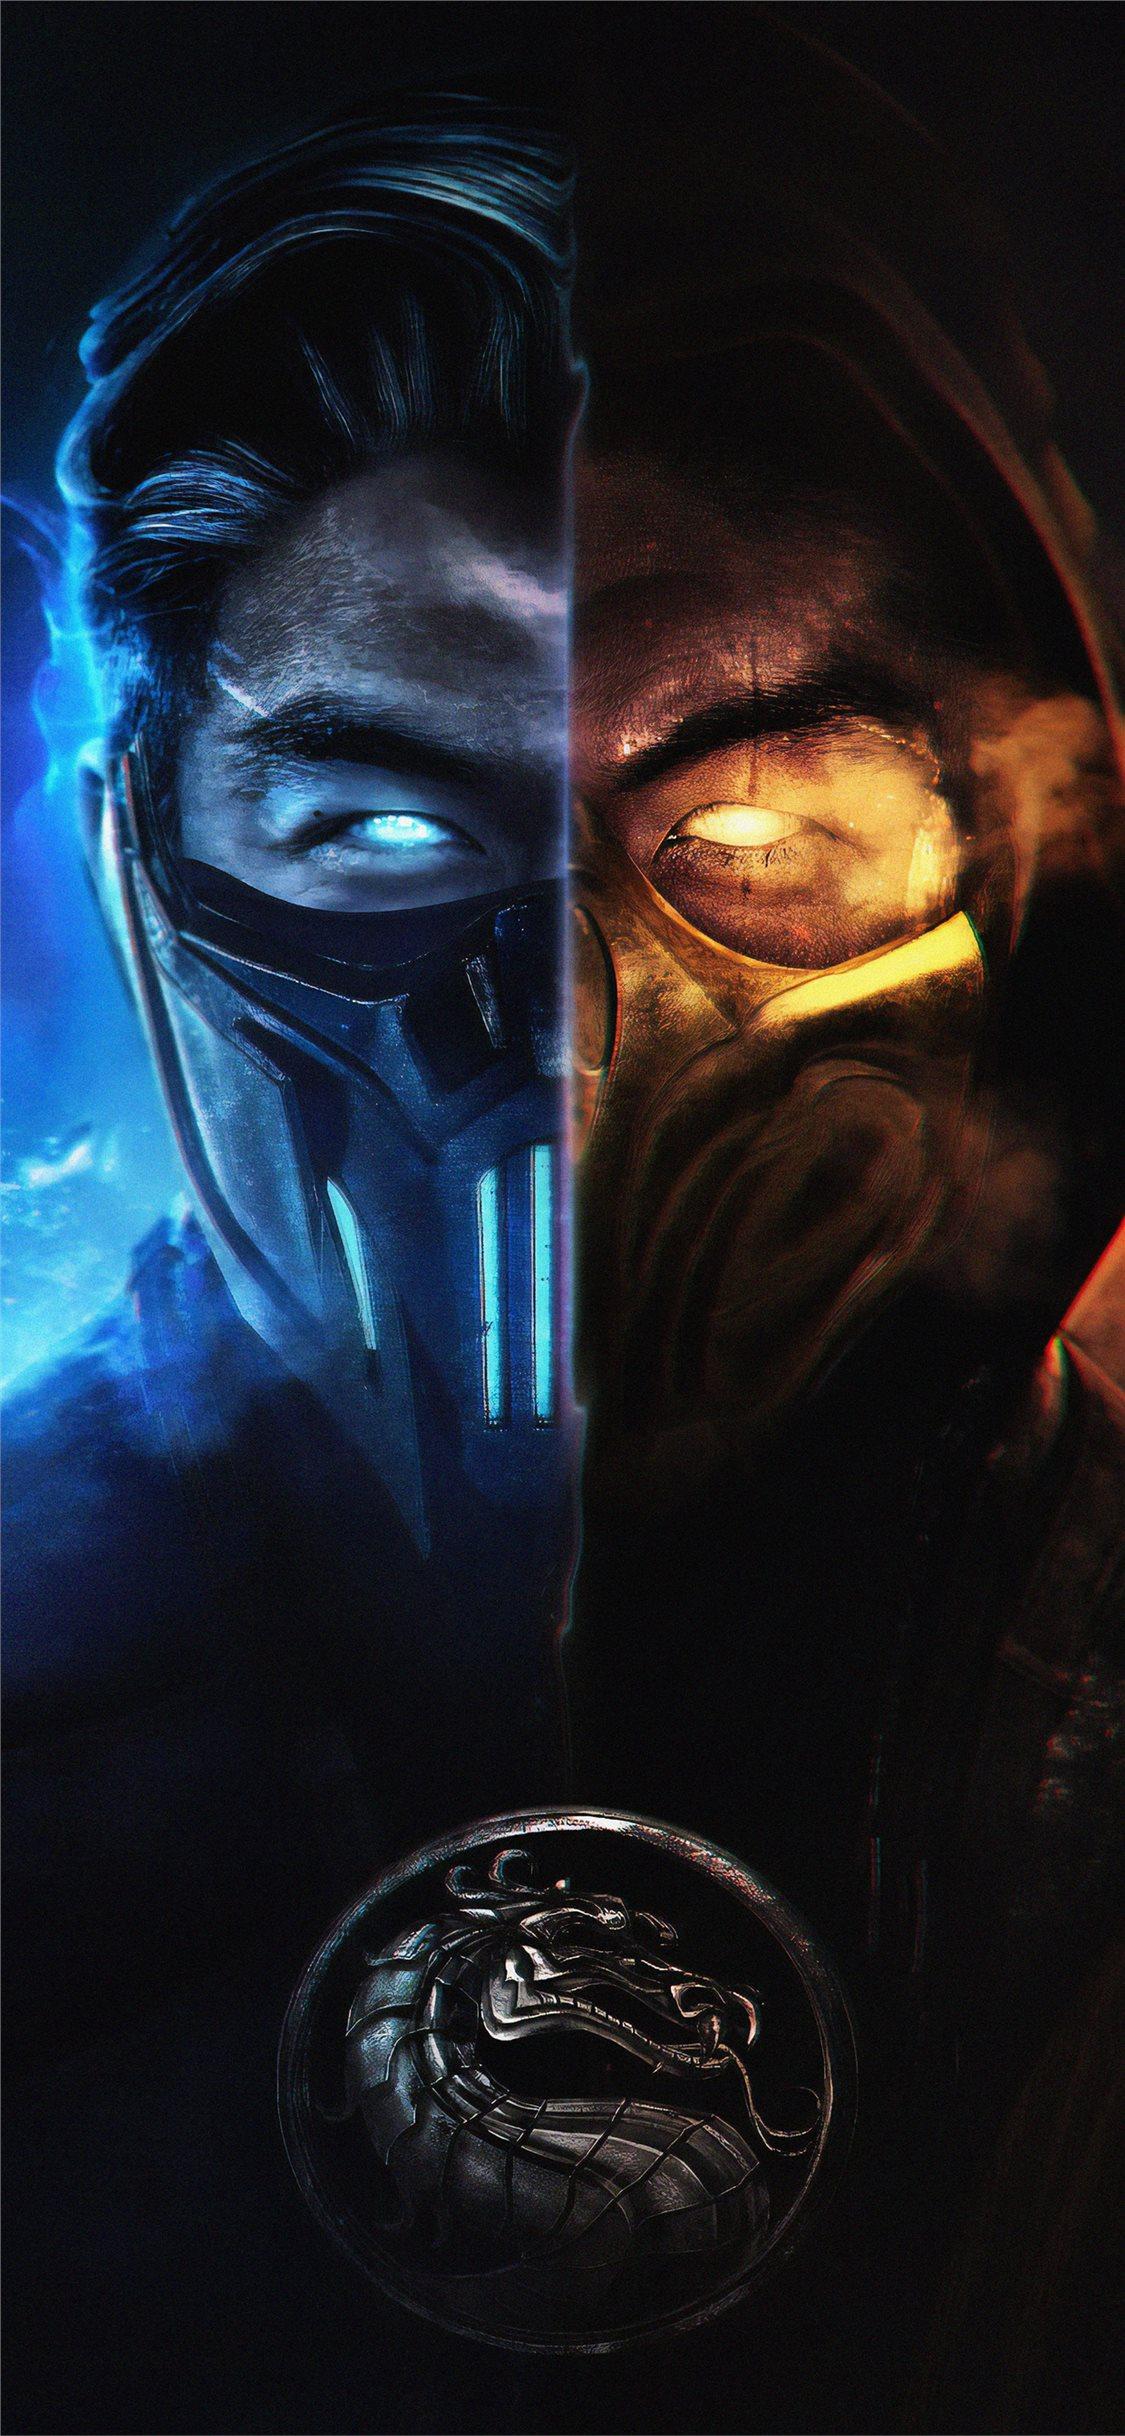 Mortal Kombat Subzero And Scorpion Iphone Wallpapers Free Download